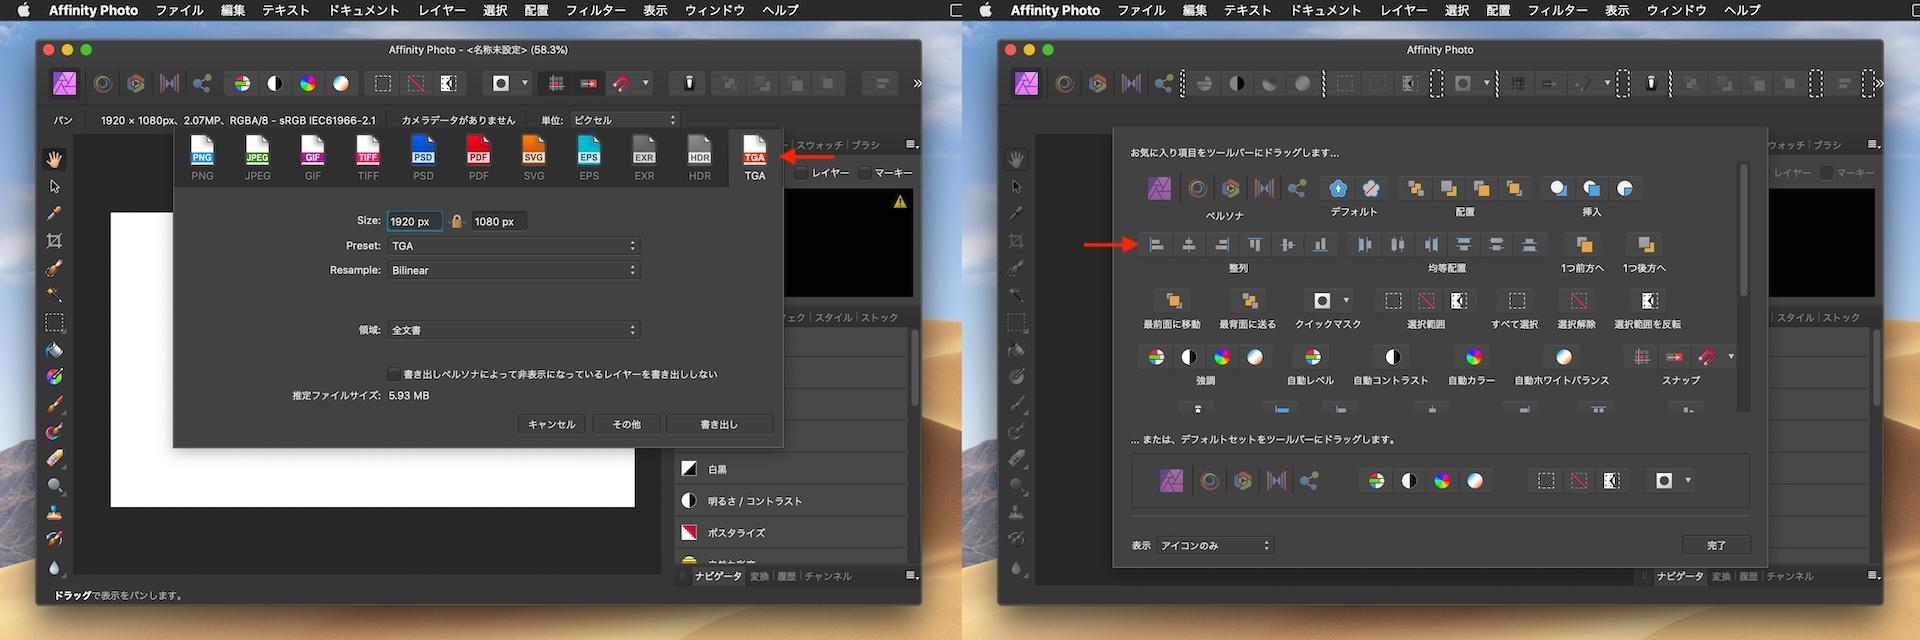 Affinity Photo v1.7.2の新機能